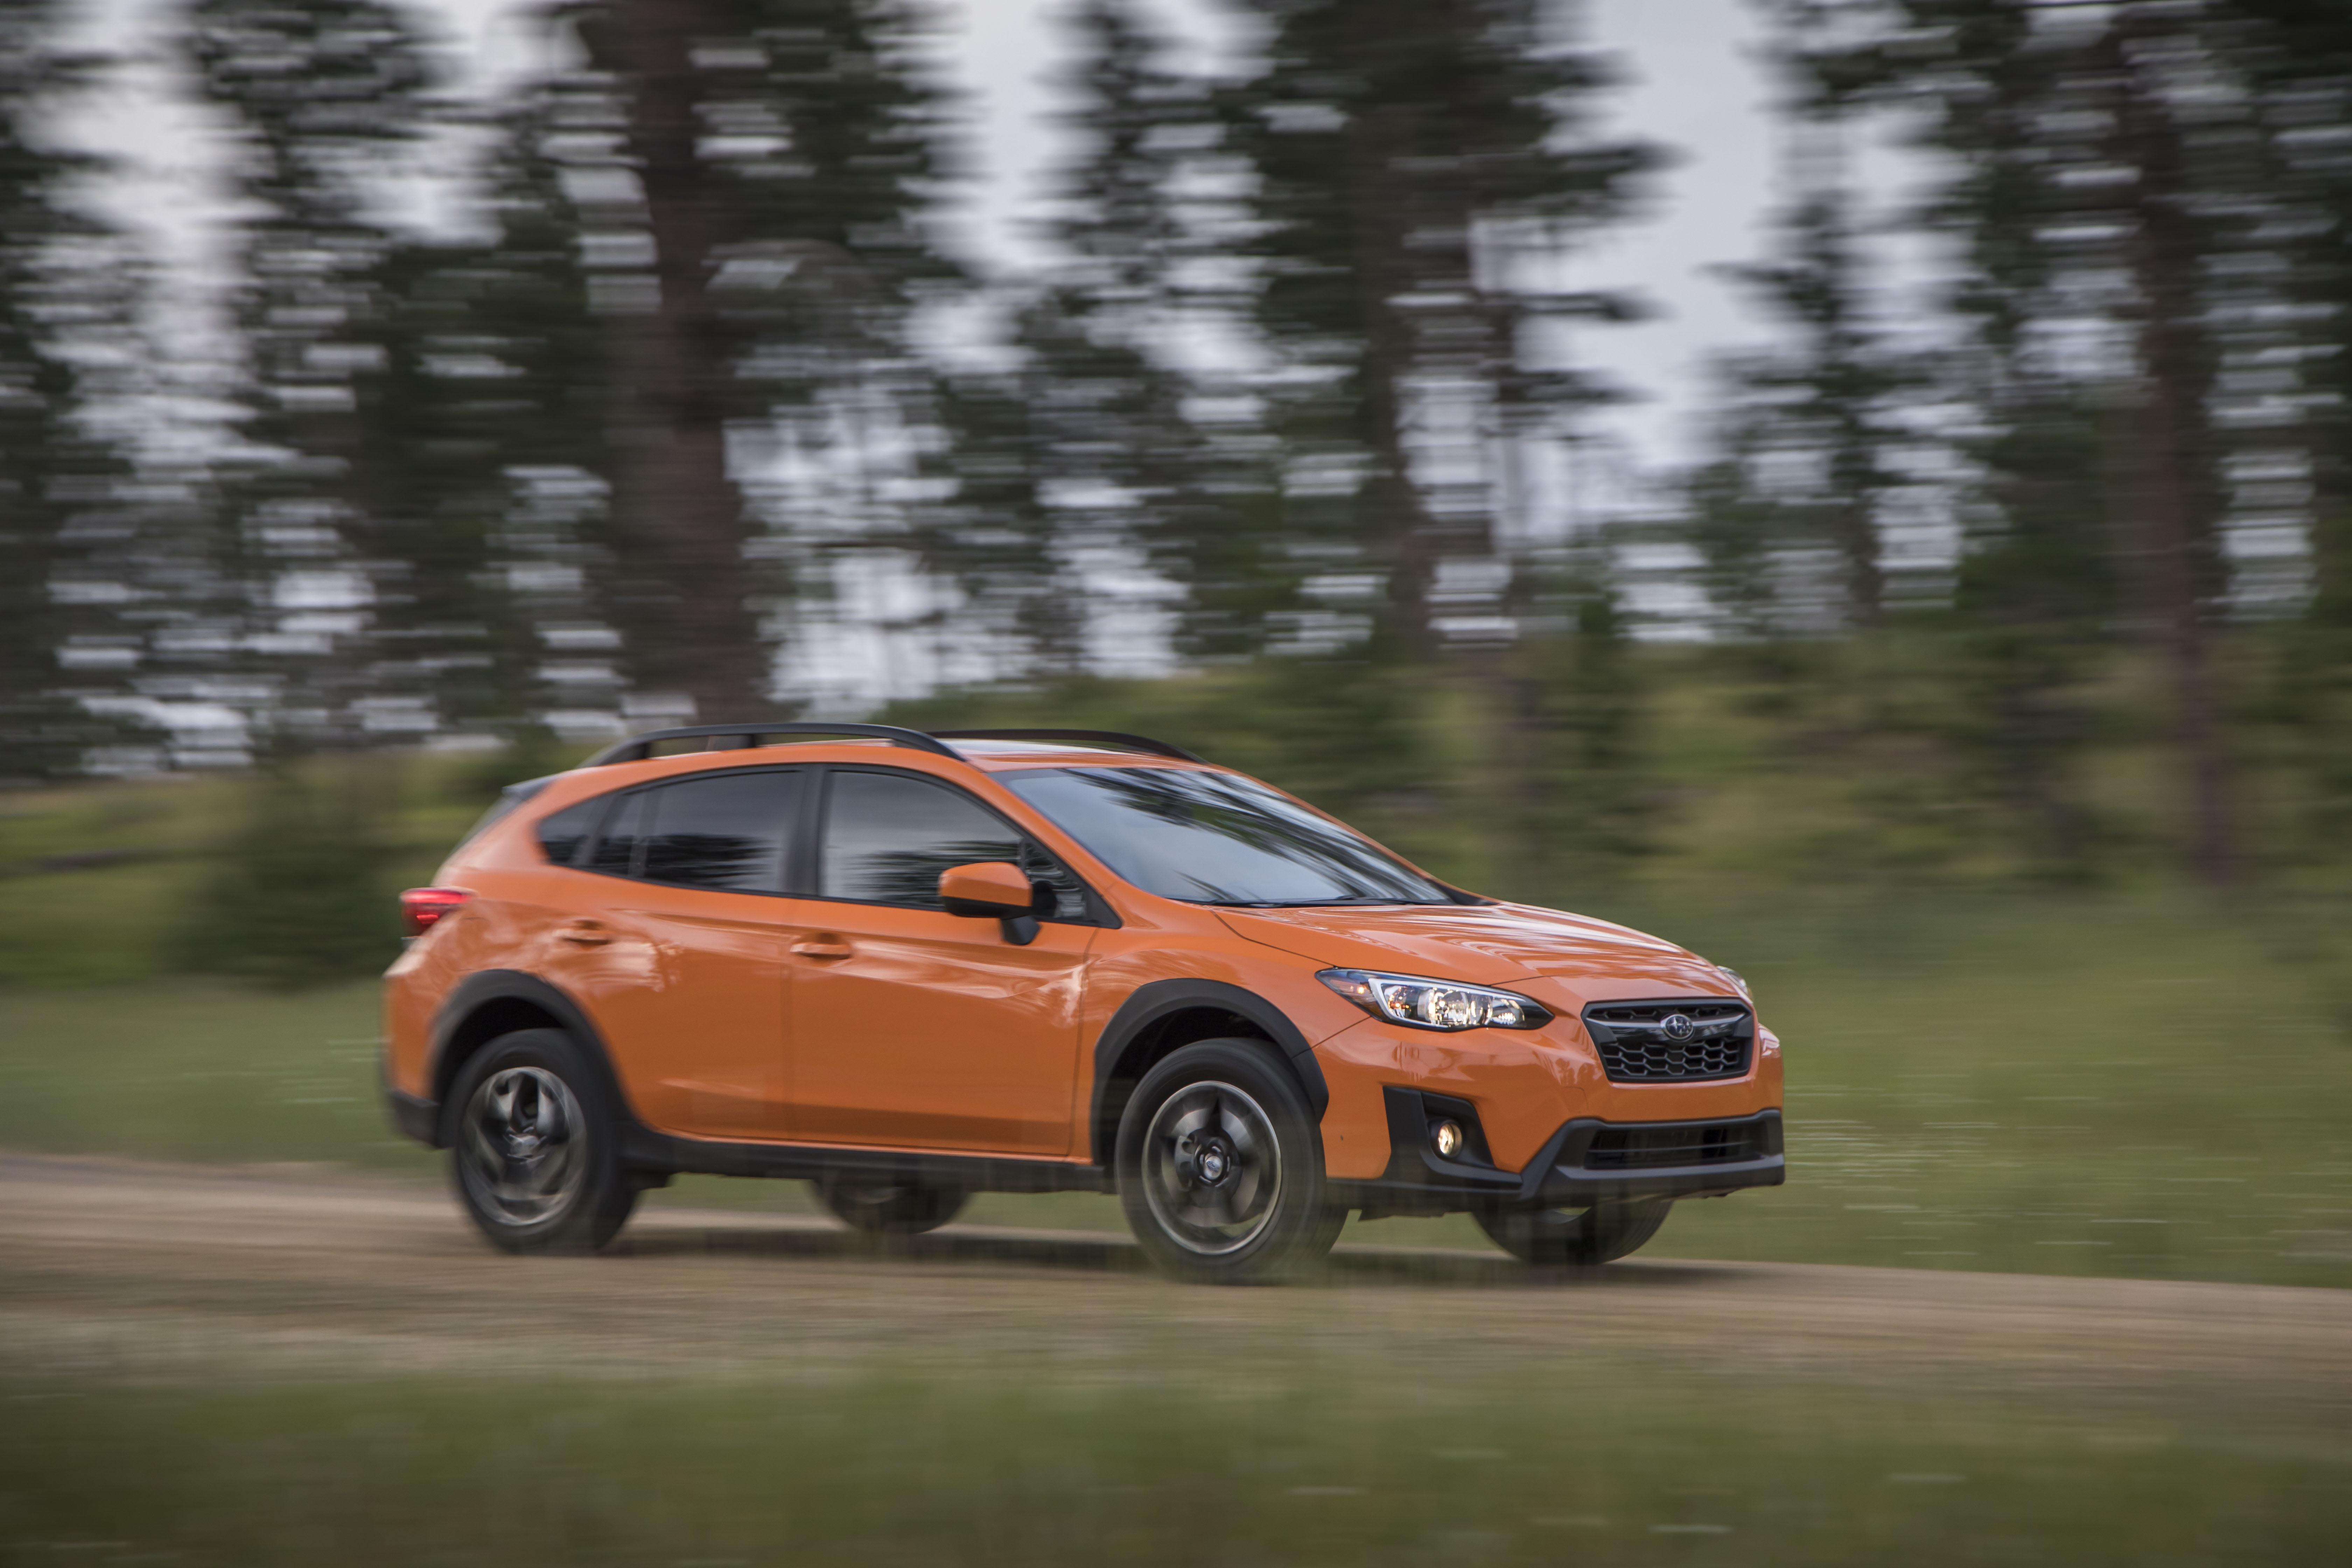 Subaru's 2020 Crosstrek Adds Tech for Higher Price Tag